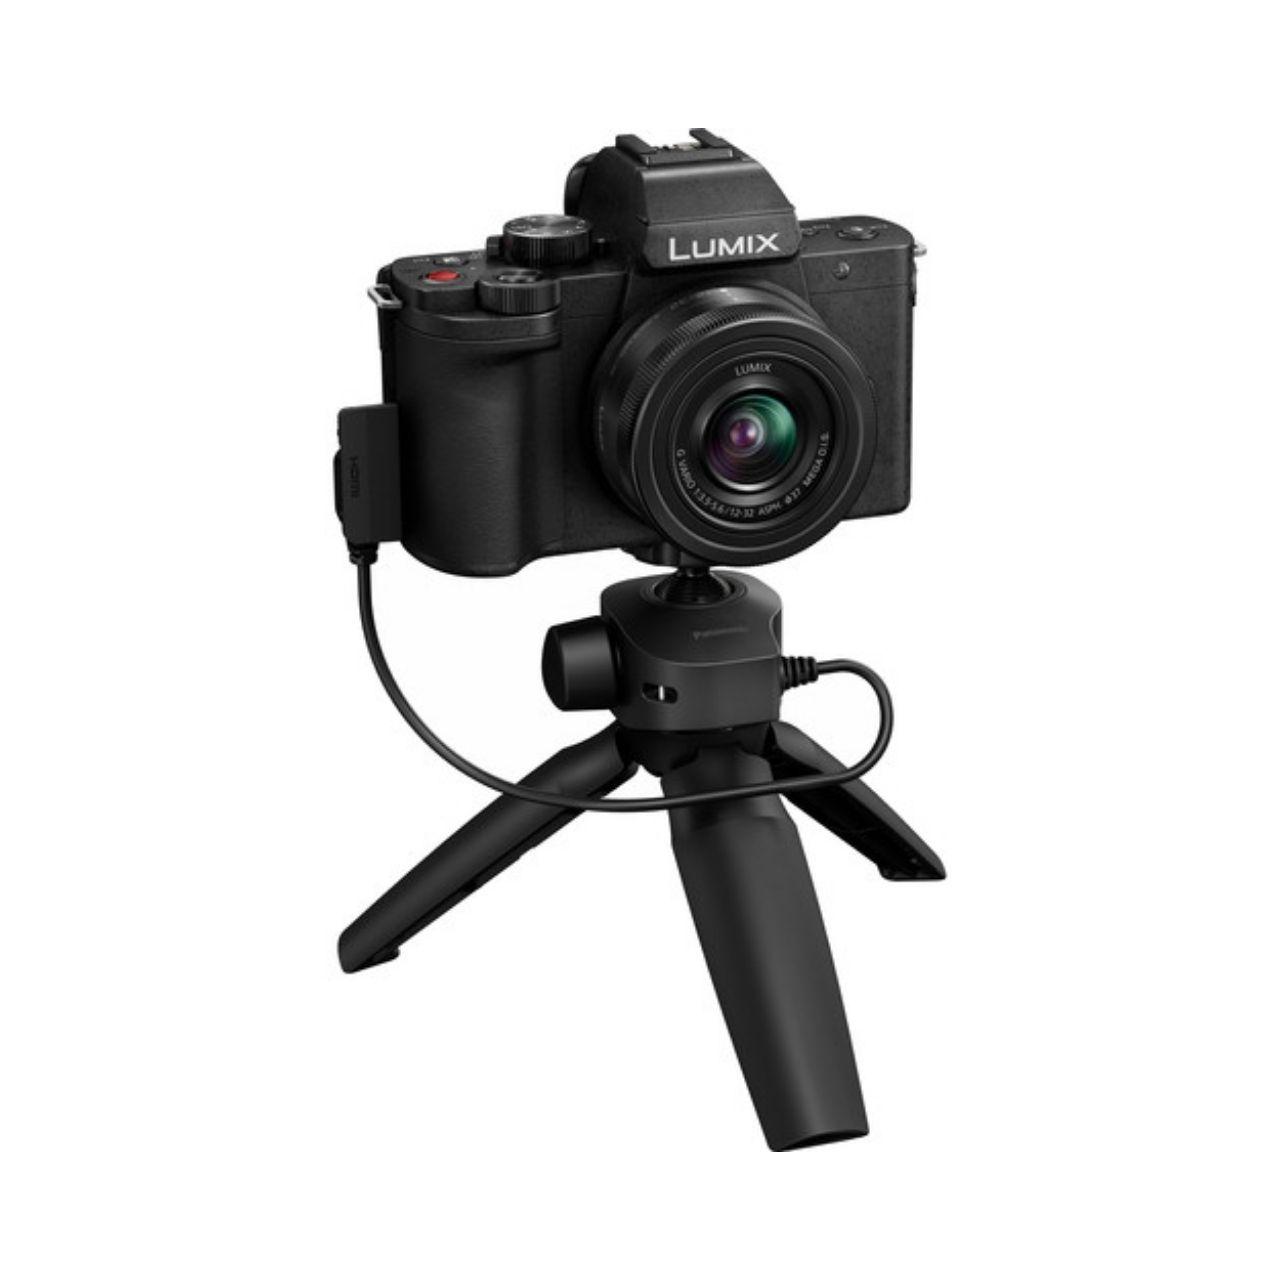 Panasonic Cámara Evil Lumix G100VEC-K Negra Obj. 12-32mm + Trípode SHGR1 (sds)